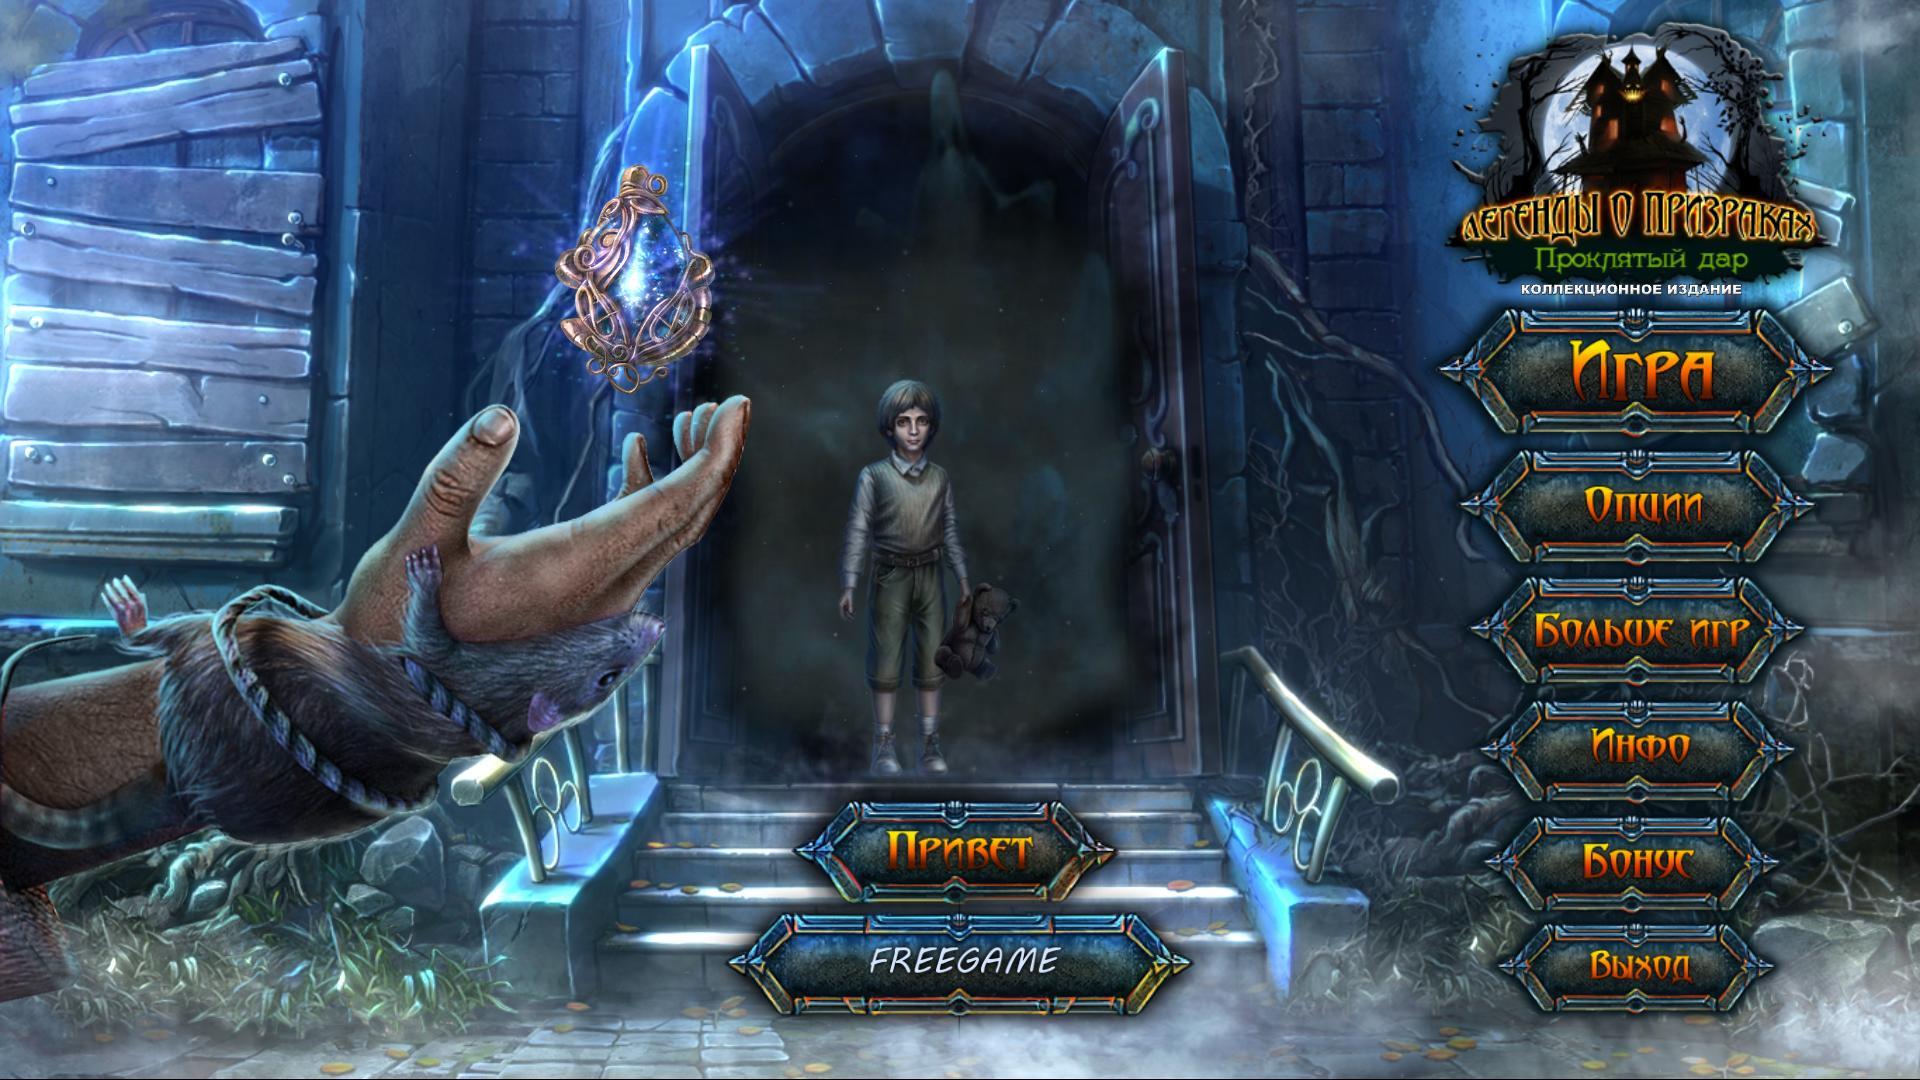 Легенды о призраках 11: Проклятый дар. Коллекционное издание | Haunted Legends 11: The Cursed Gift CE (Rus)